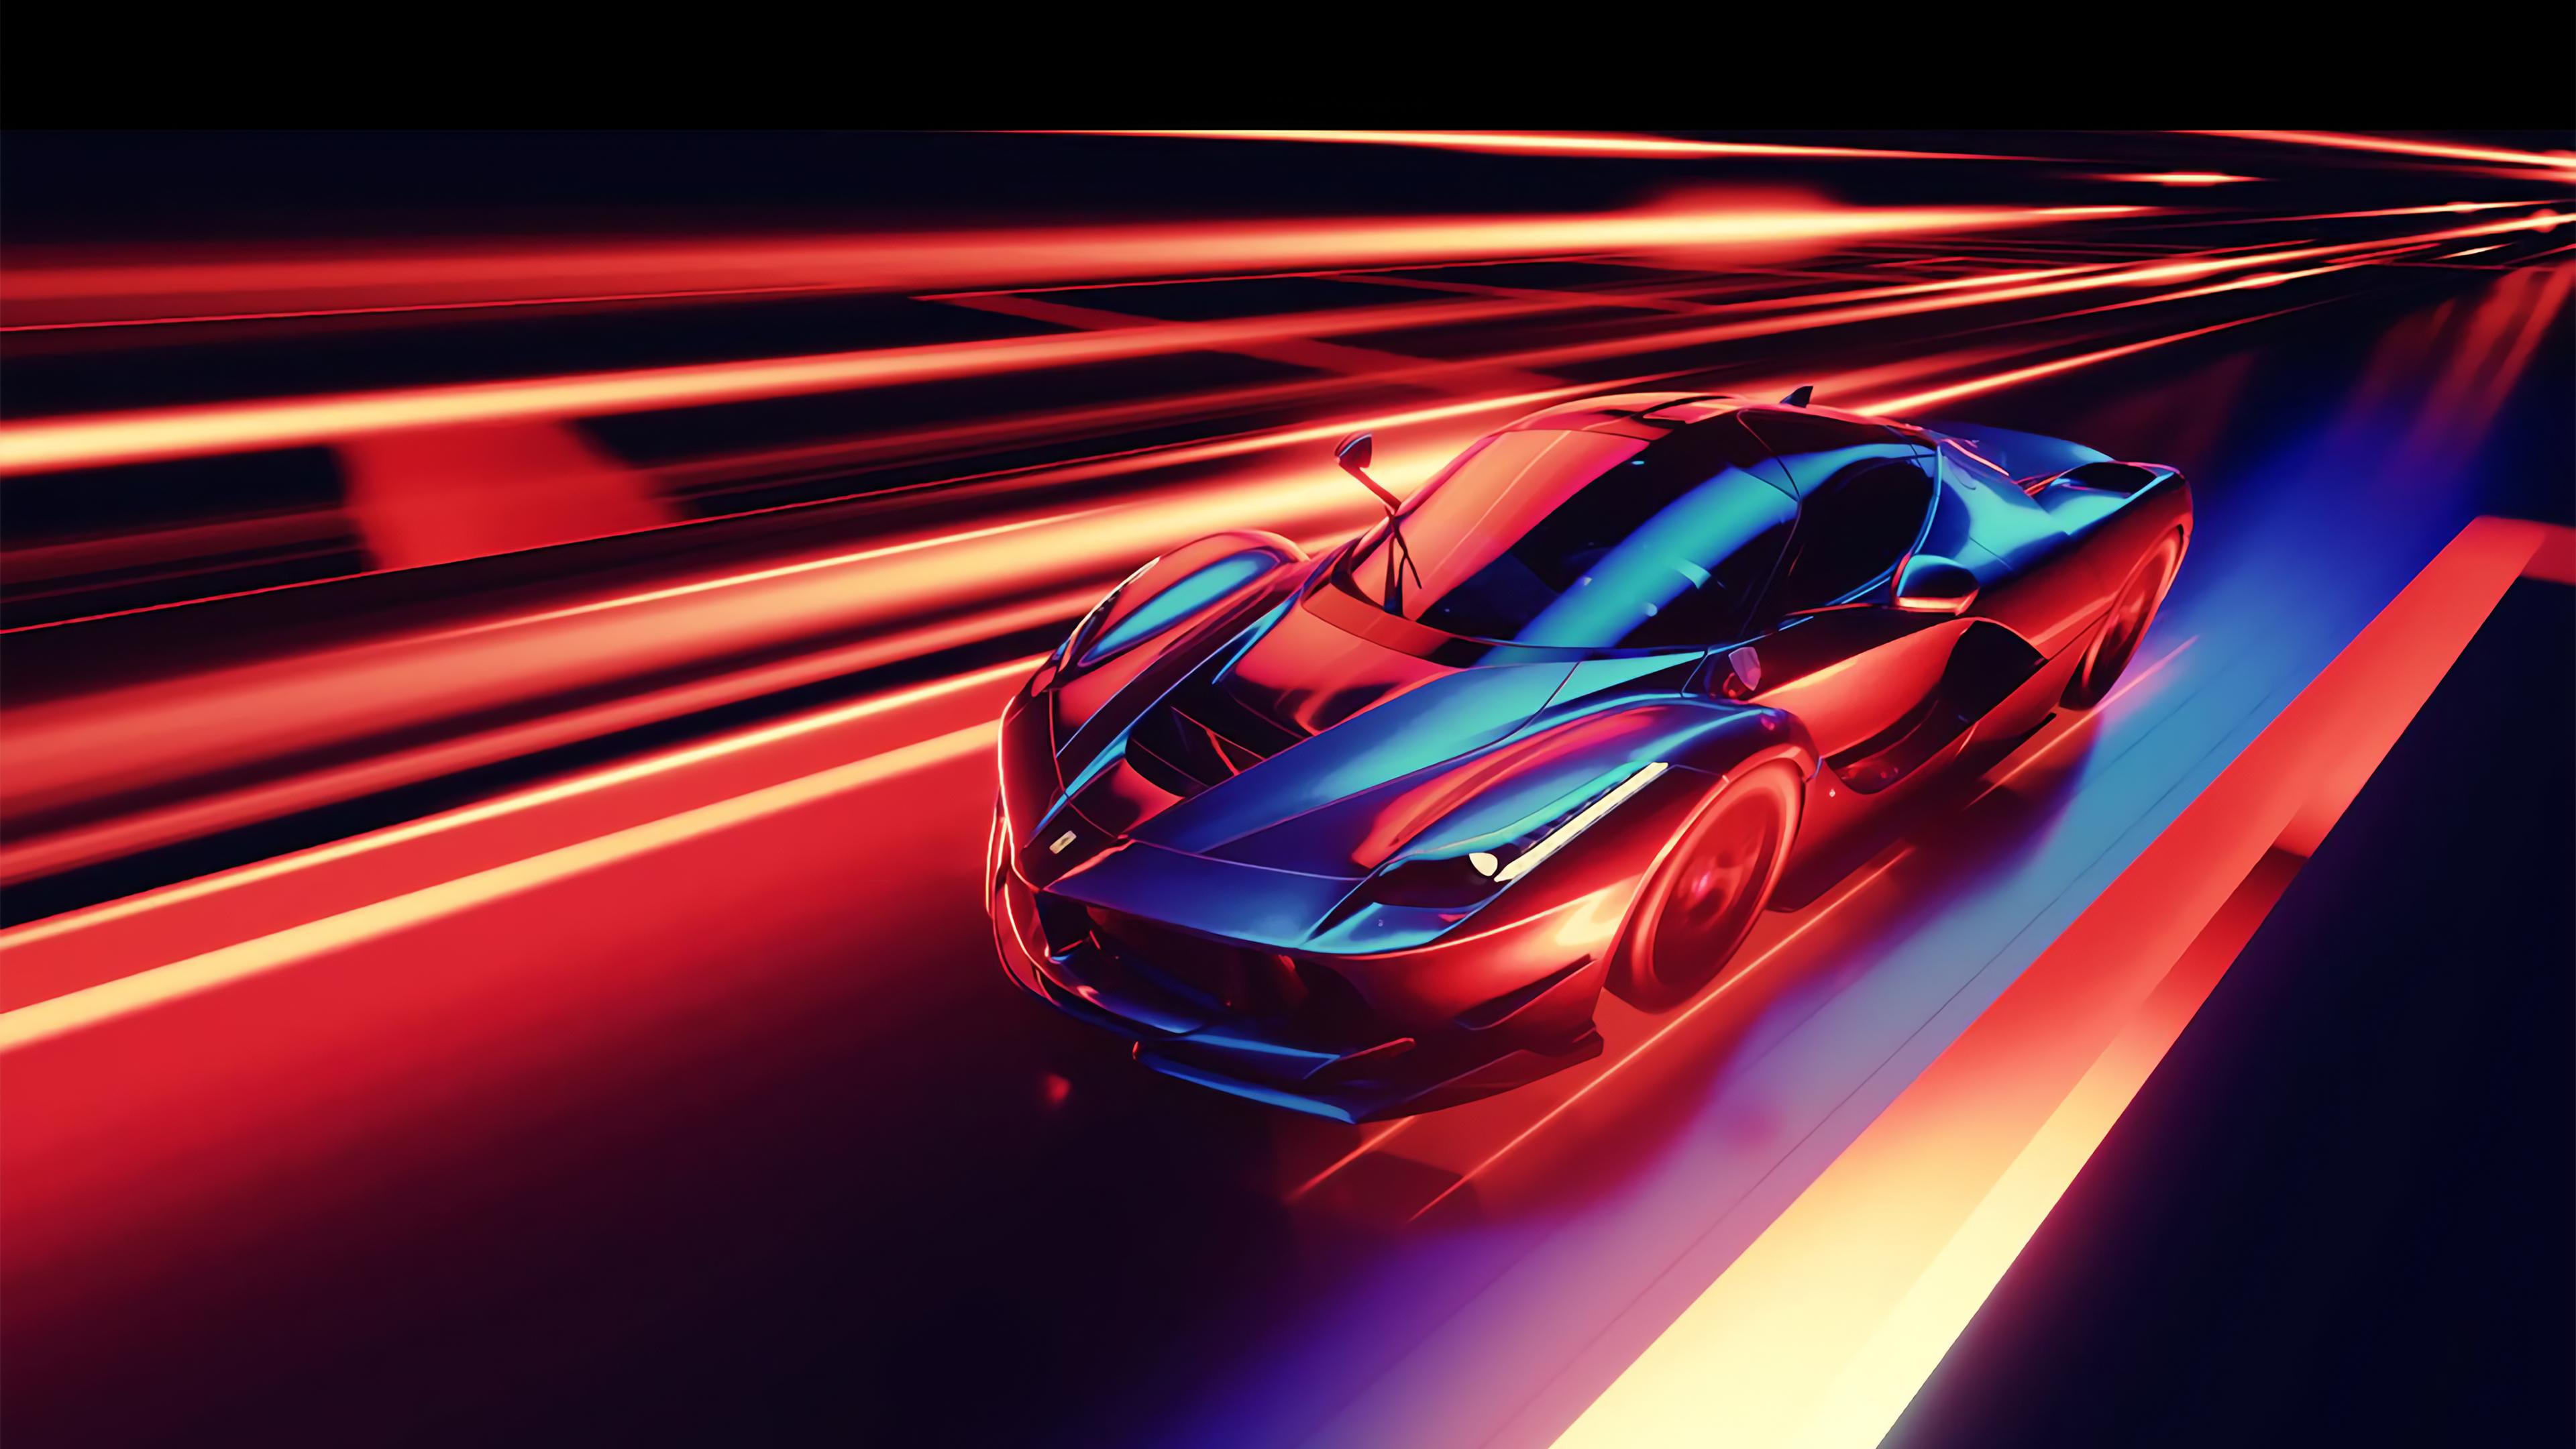 1920x1080 Ferrari Neon 1080p Laptop Full Hd Wallpaper Hd Artist 4k Wallpapers Images Photos And Background